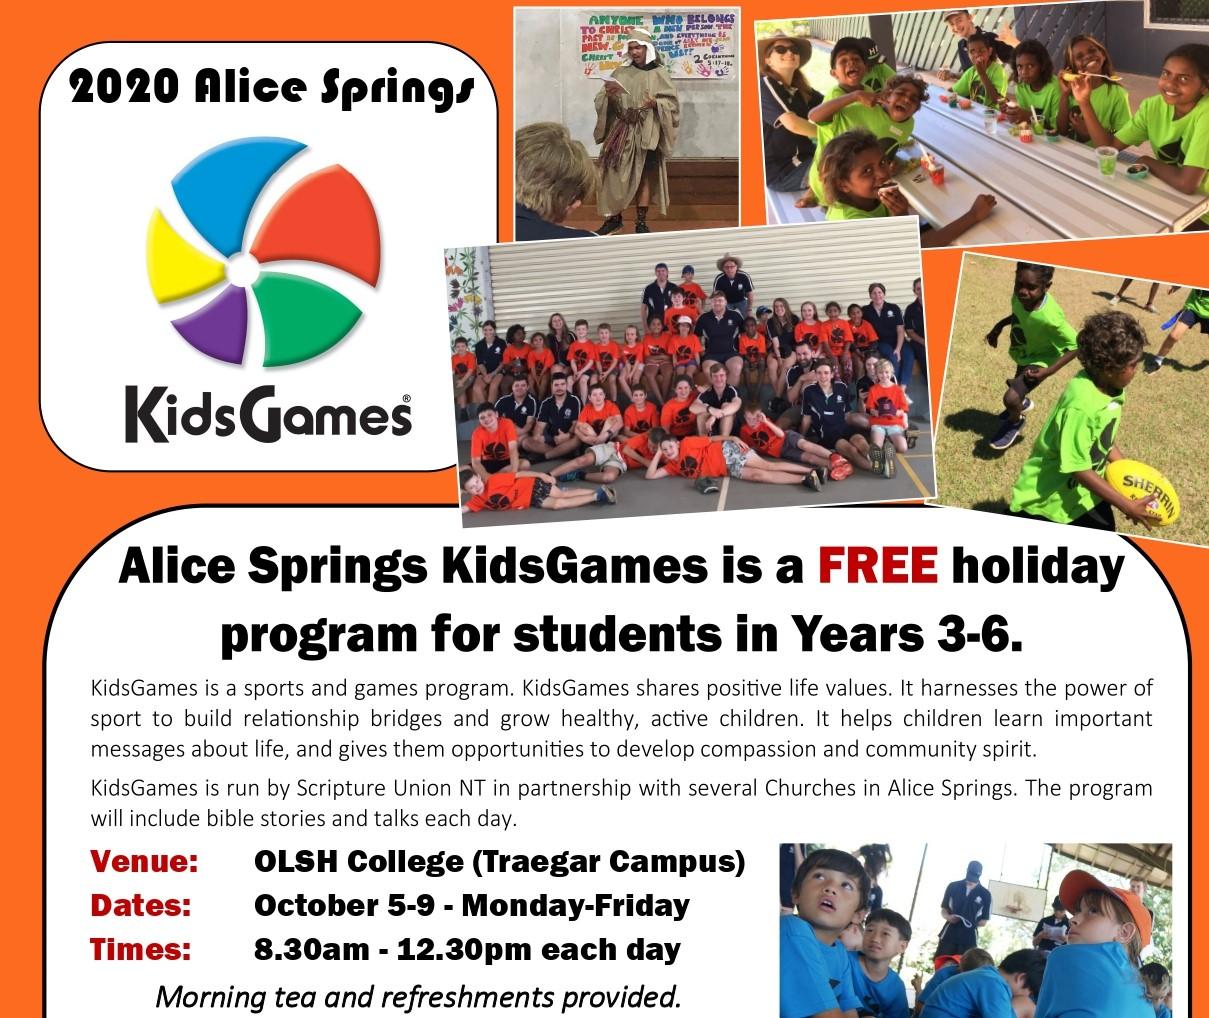 2020 Alice Springs Kids Games